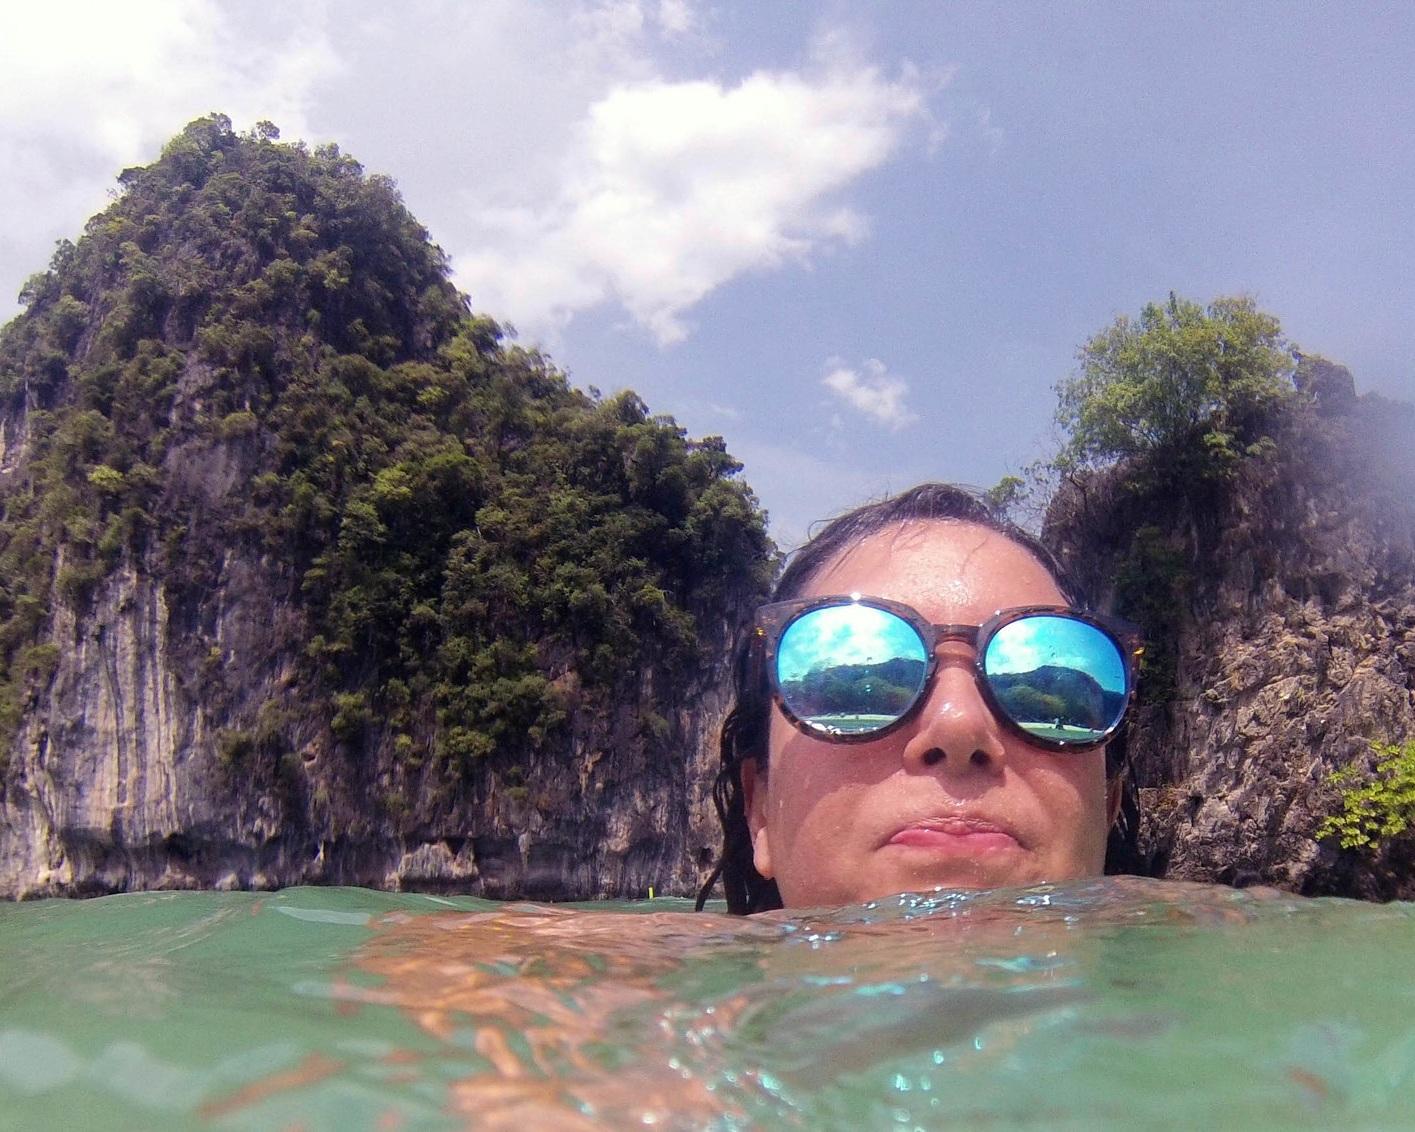 Snorkeling (and feeling badass) in Krabi, Thailand